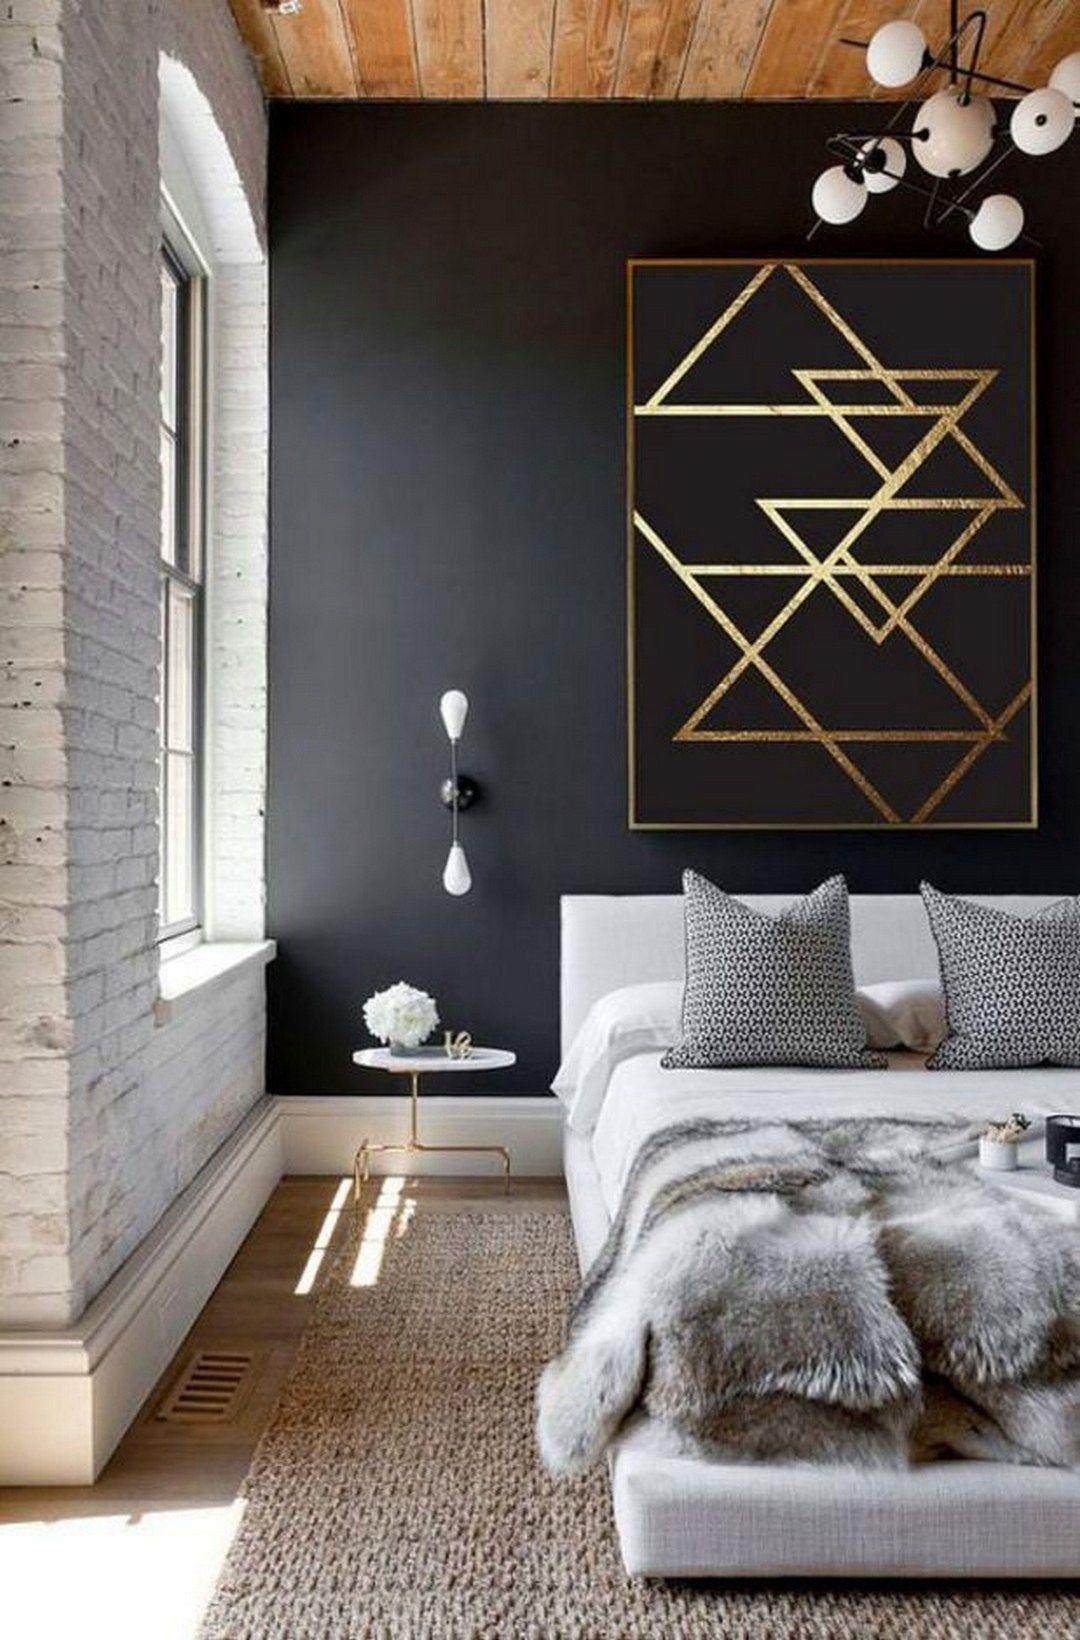 Room Tile Floors Are A Great Choice